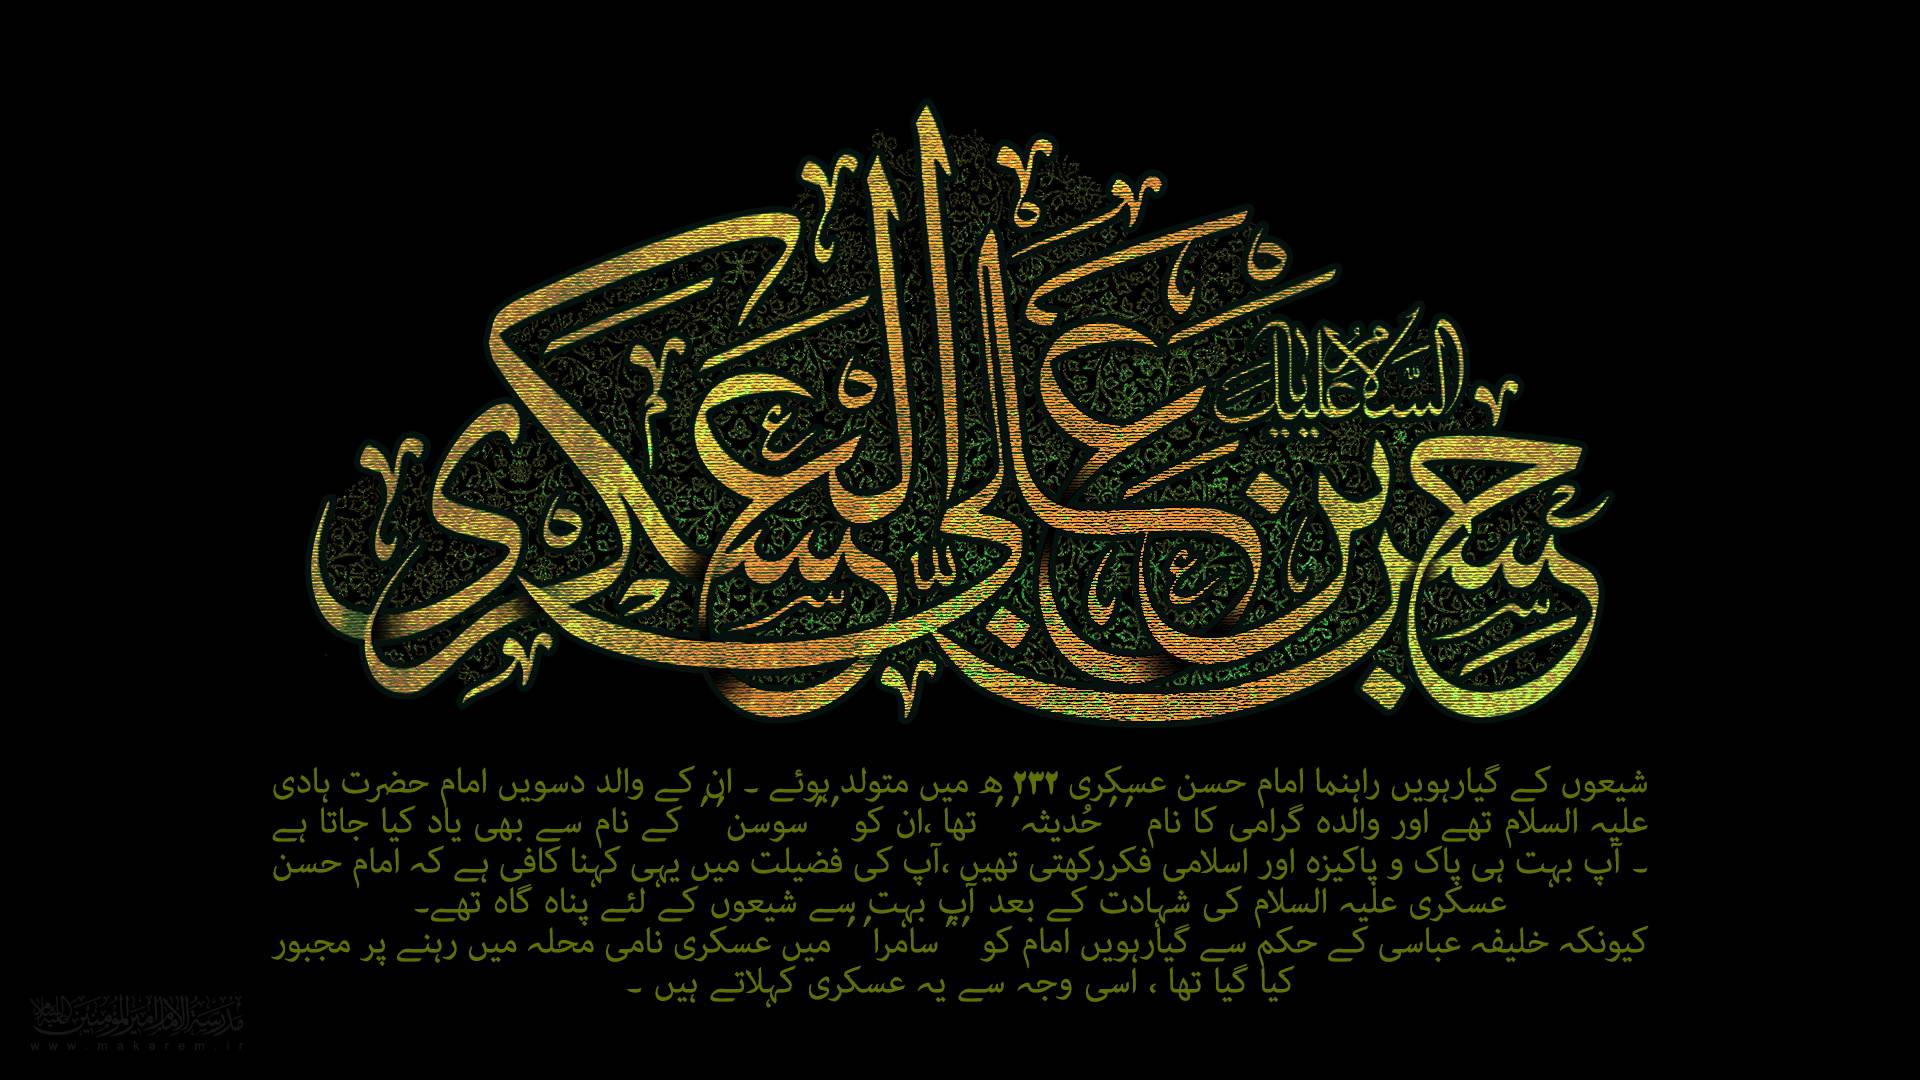 شهادت امام حسن عسکری (8)-مدرسه الامام امیر المومنین (ع)